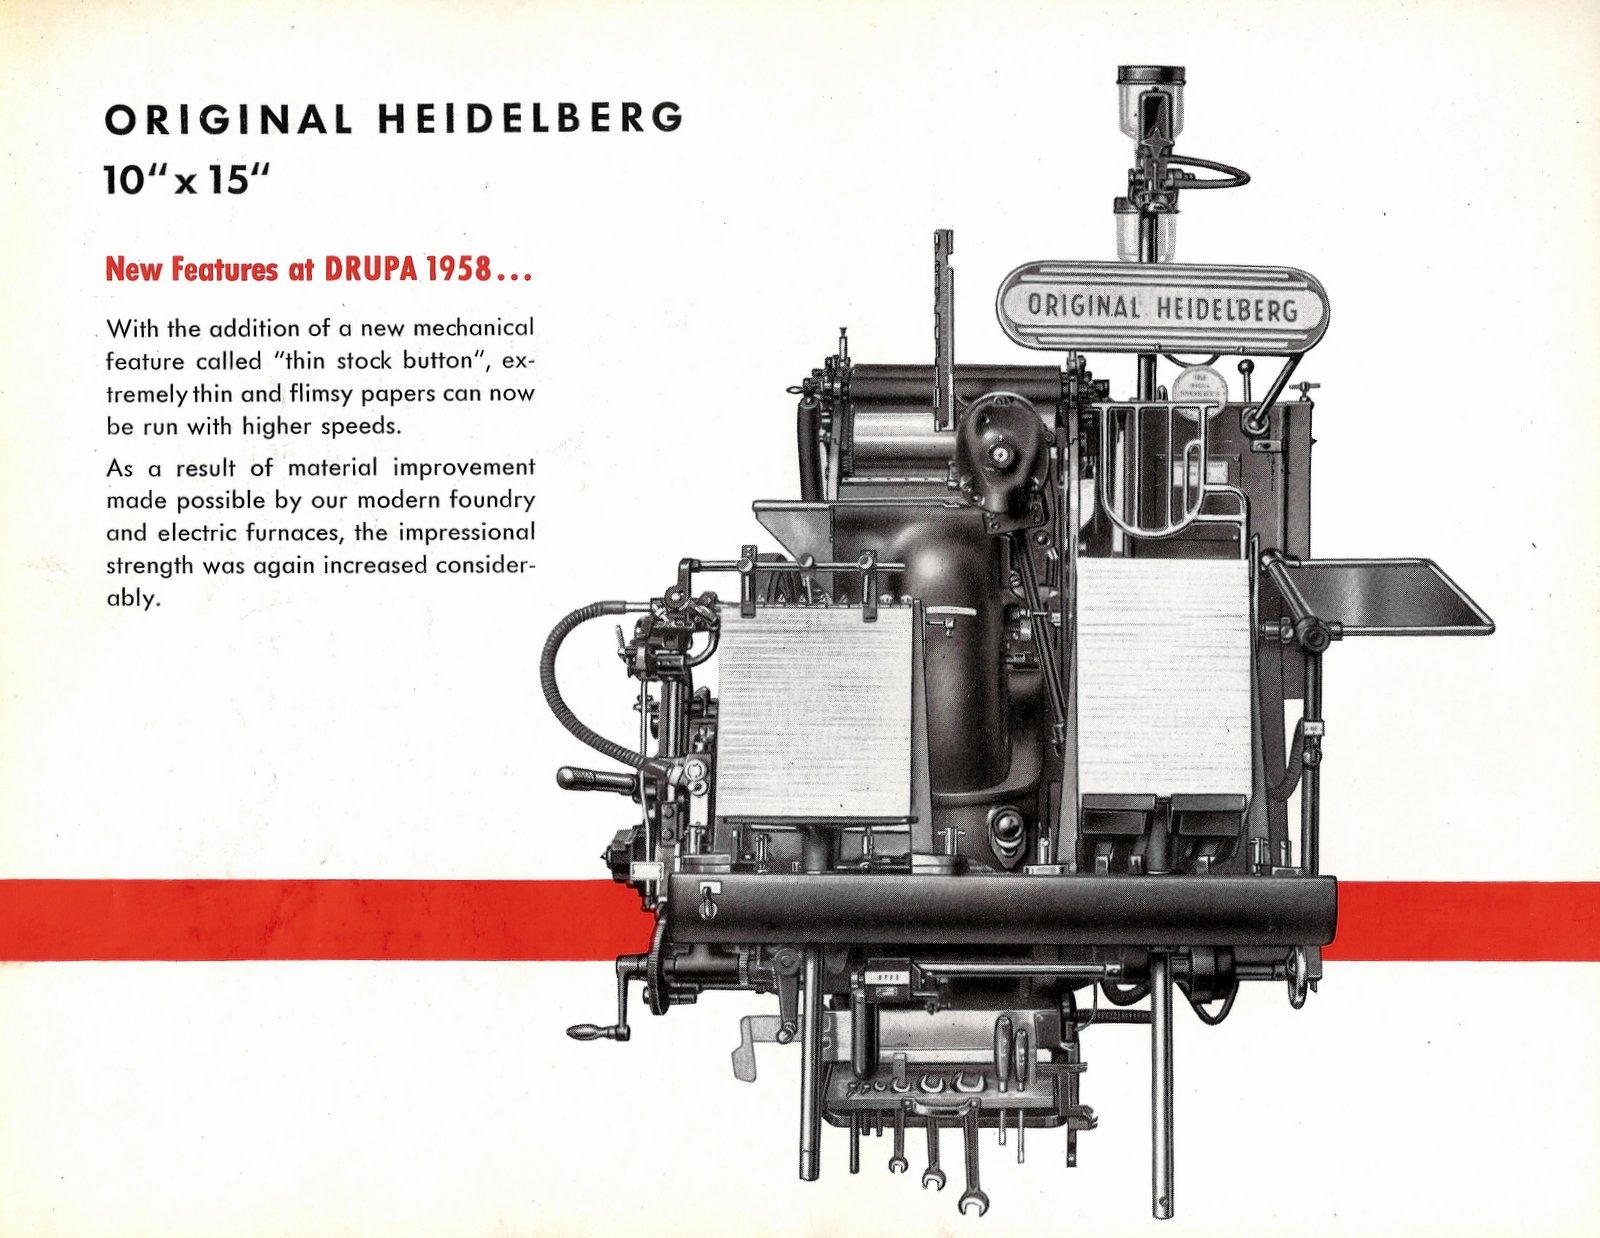 Heidelberg 10 x 15